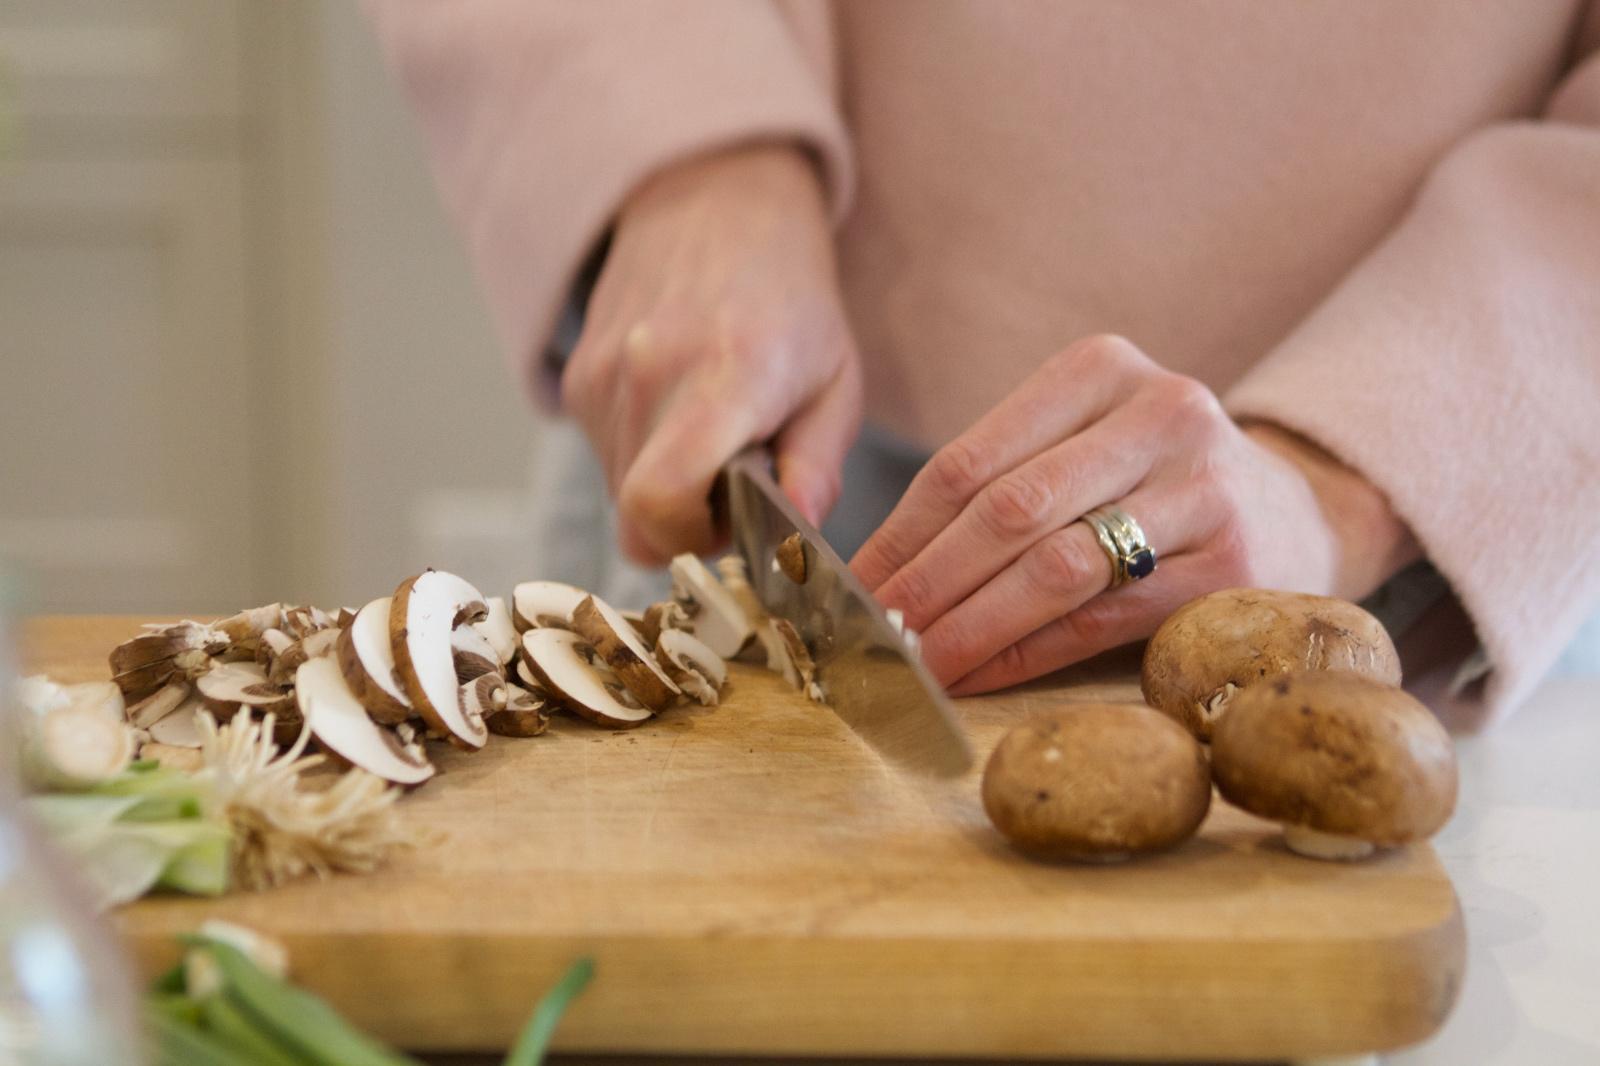 Lindsay chopping mushrooms